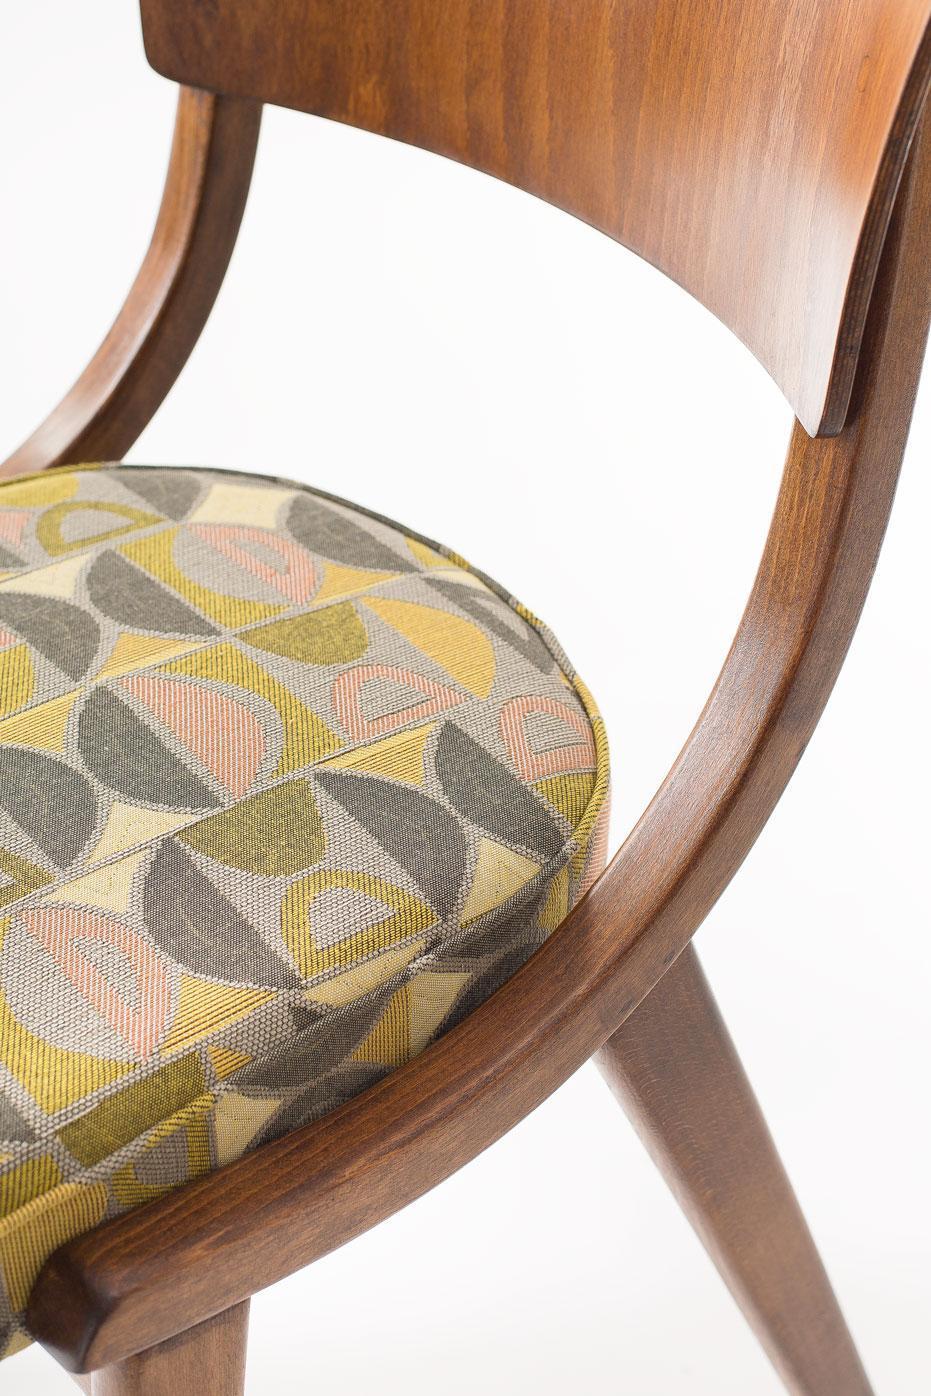 krzeslo skoczek 2